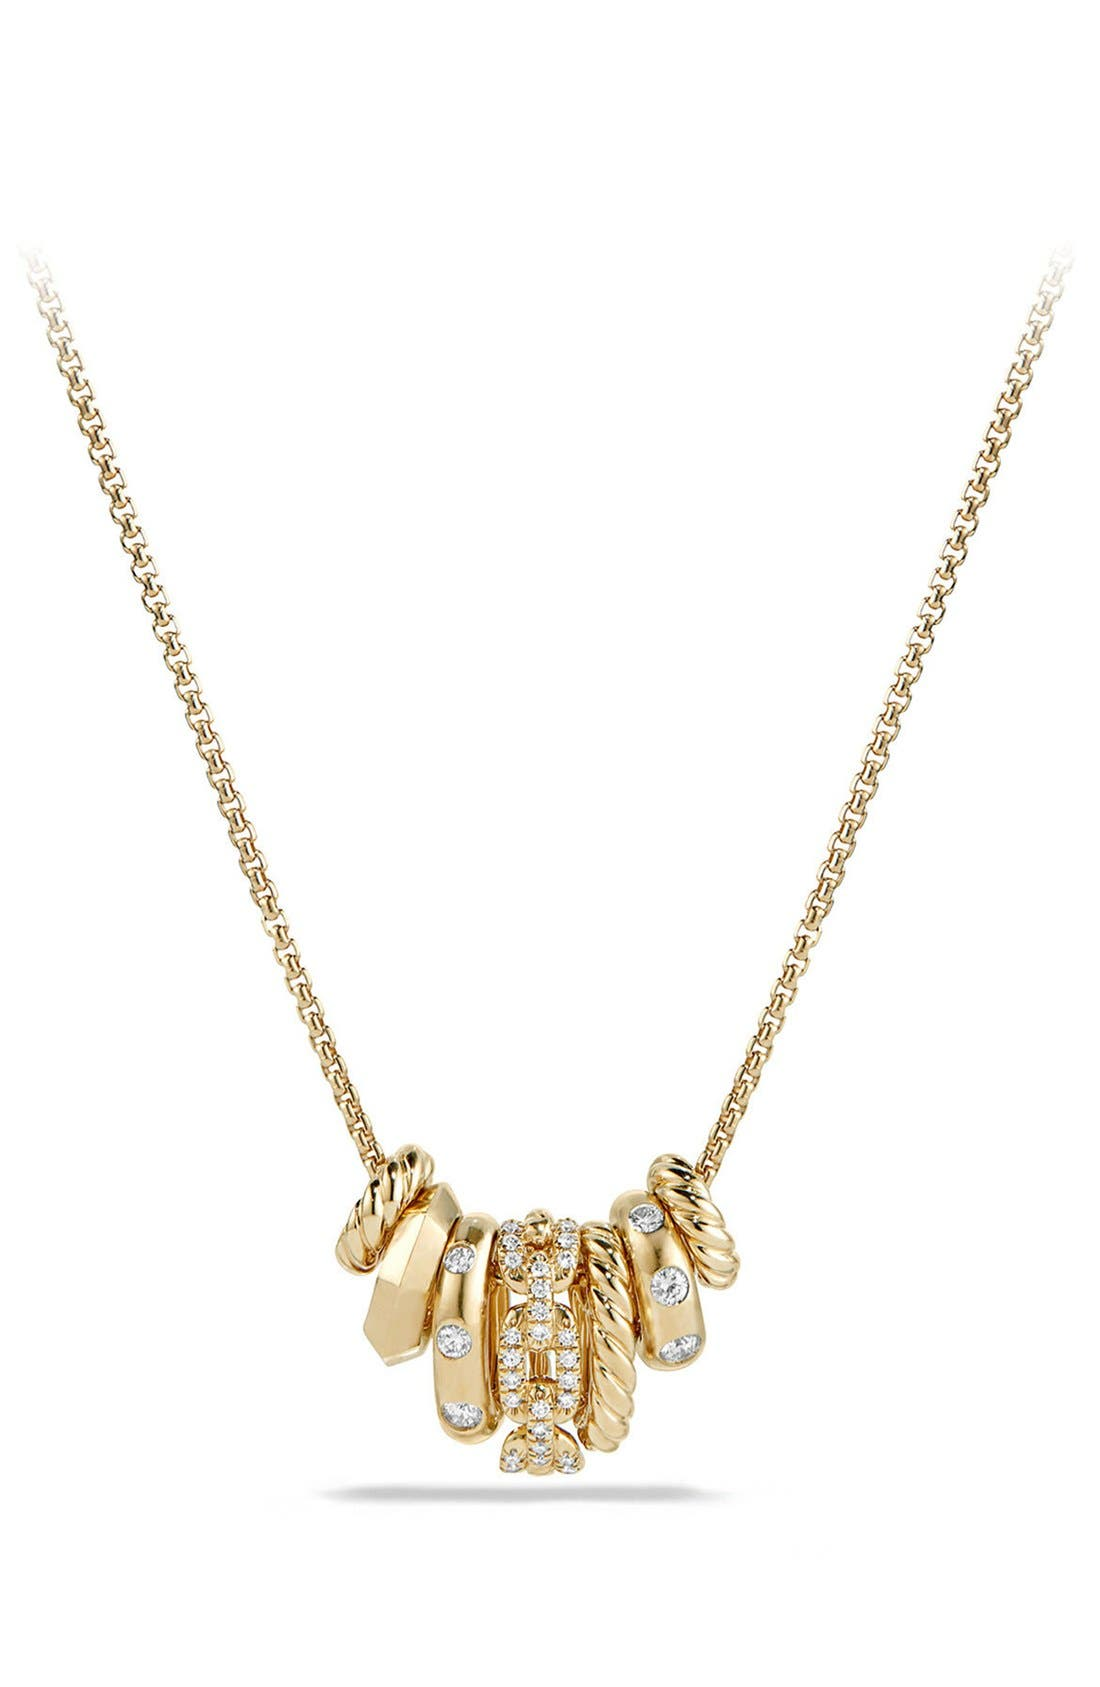 David Yurman 'Stax' Pendant Necklace with Diamonds in 18K Gold